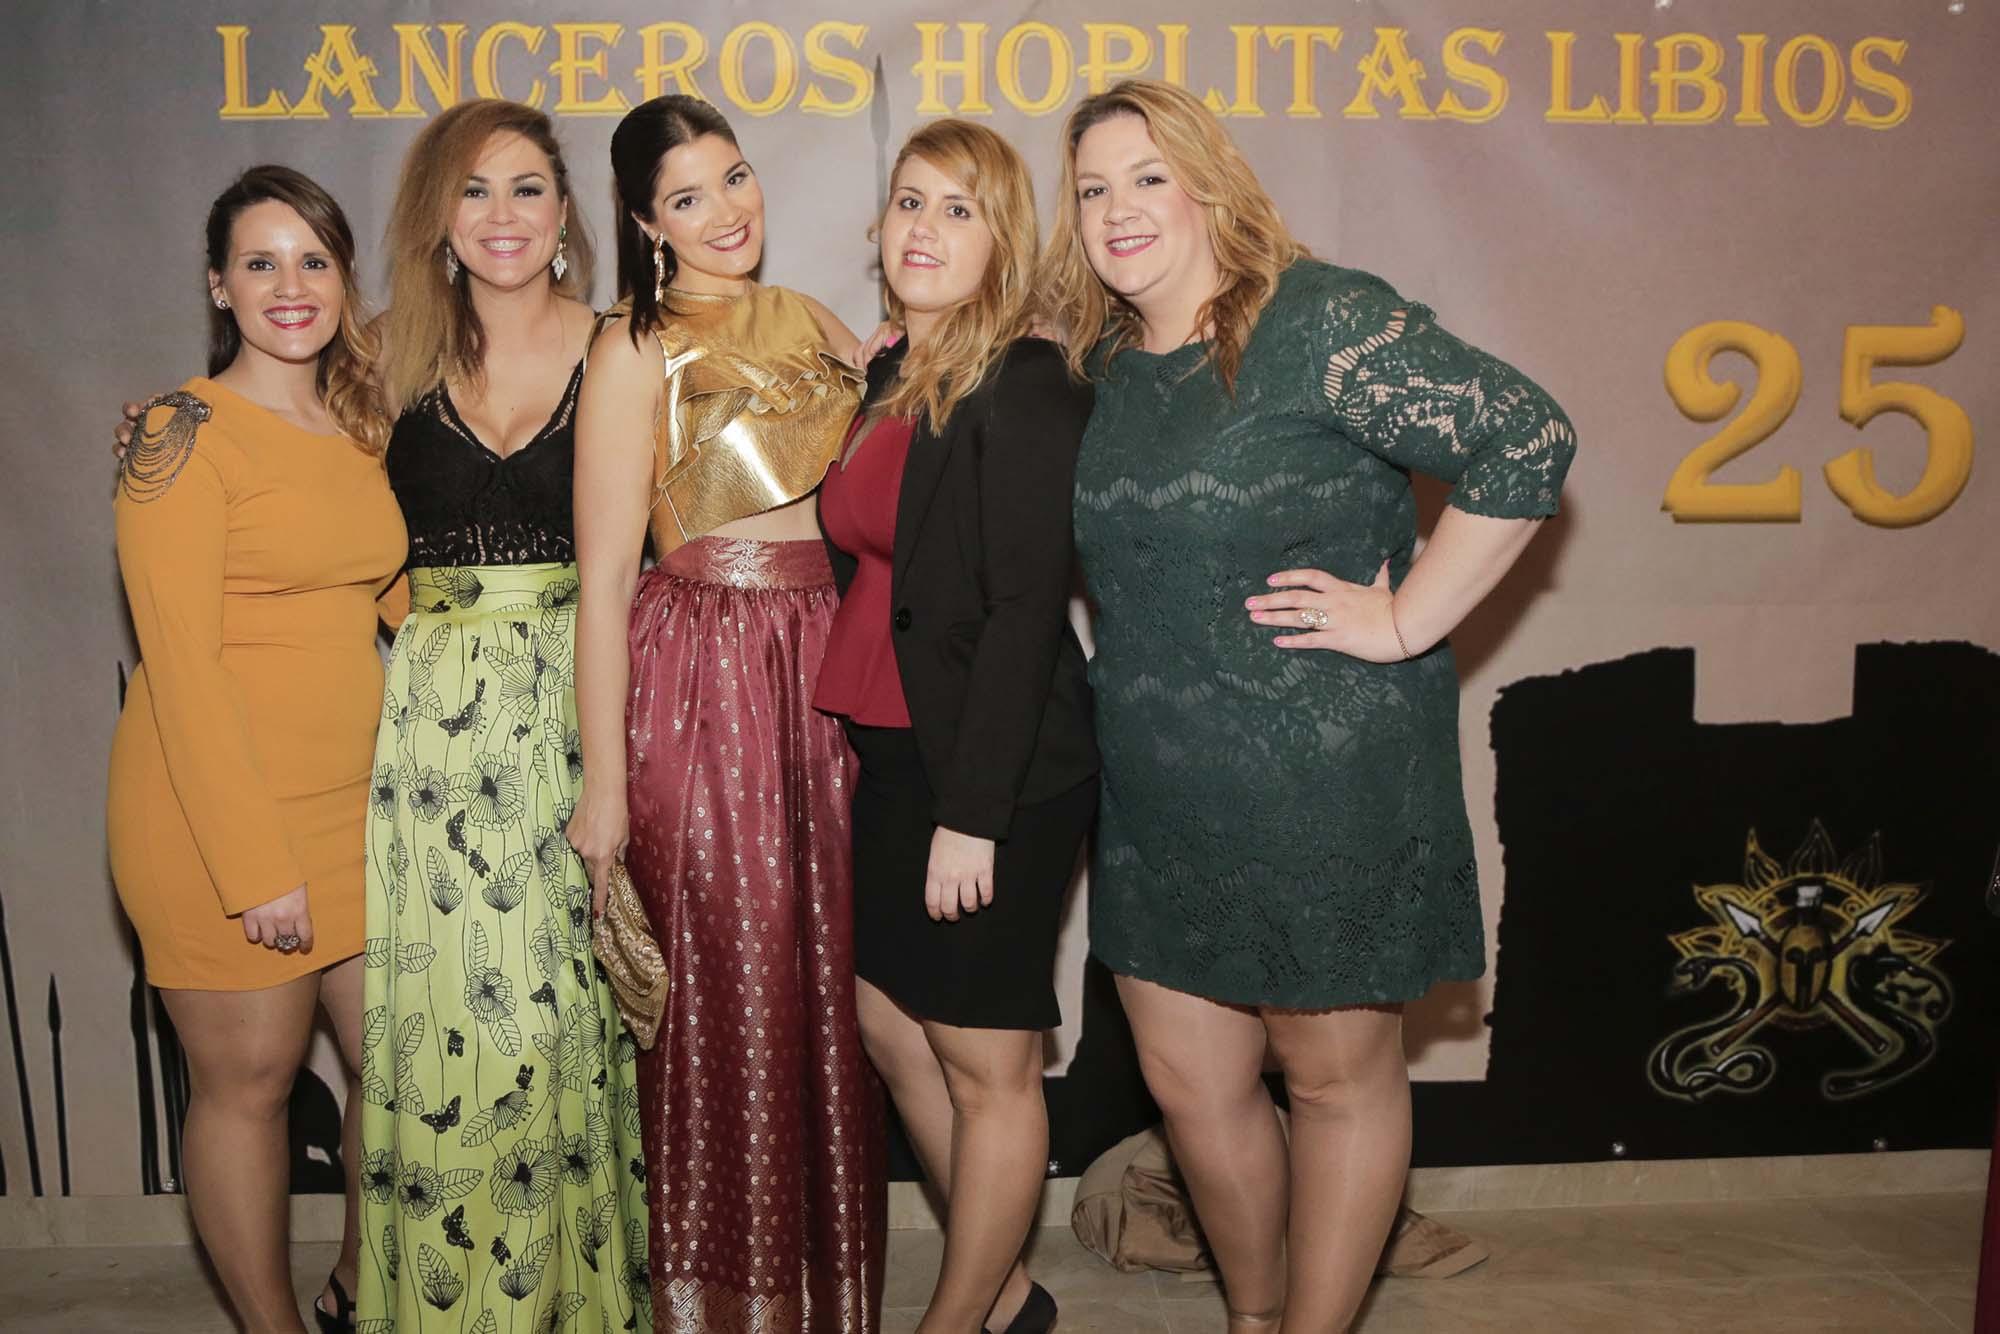 Lanceros Hoplitas Libios  (226)